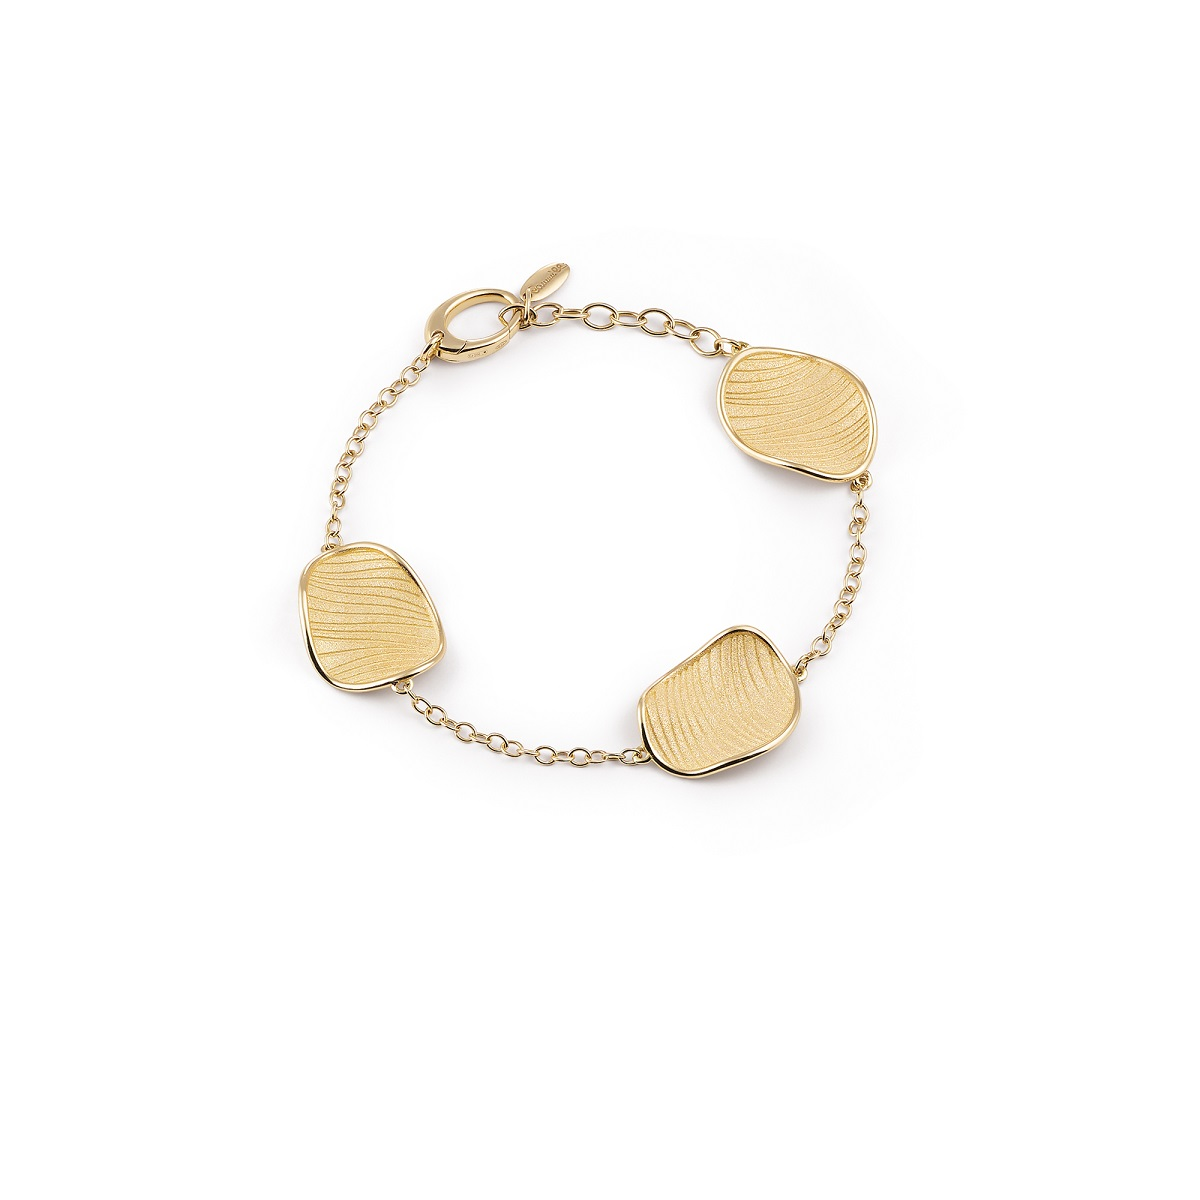 Annamaria Cammilli Velvet Armband aus Gelbgold